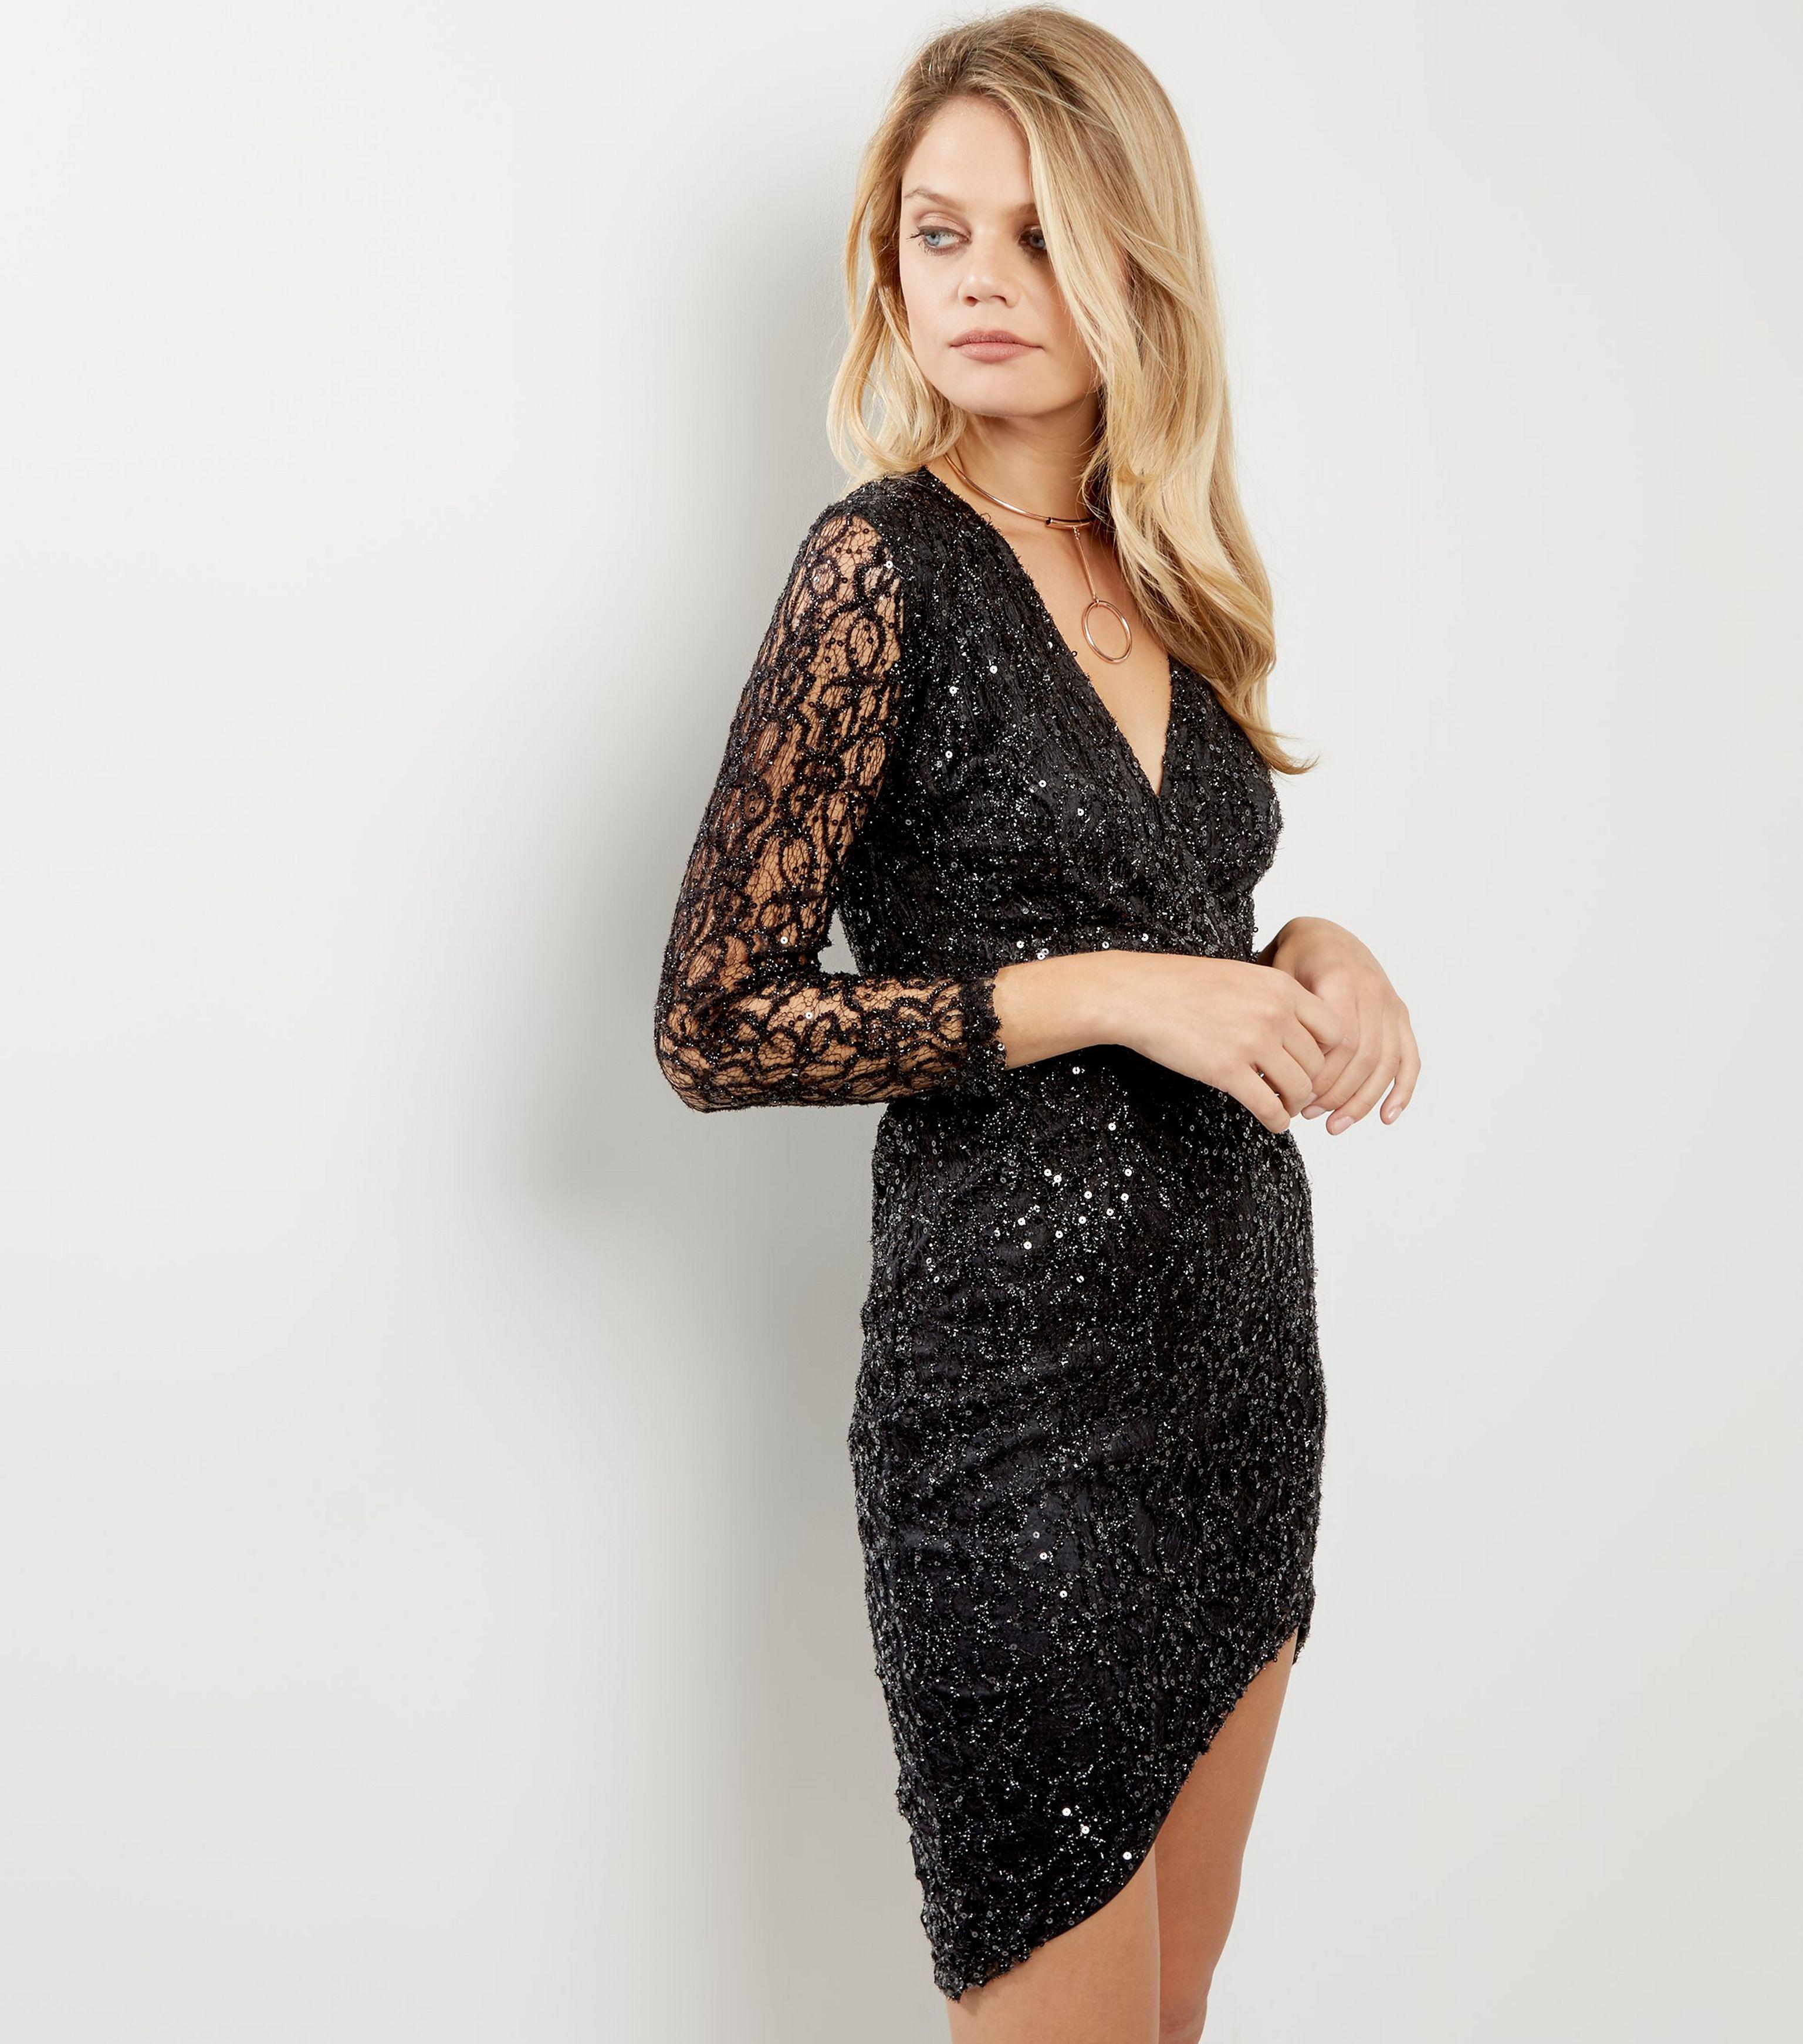 cced23dcf7e3 AX Paris Black Plunge V Neck Sequin Dress in Black - Lyst